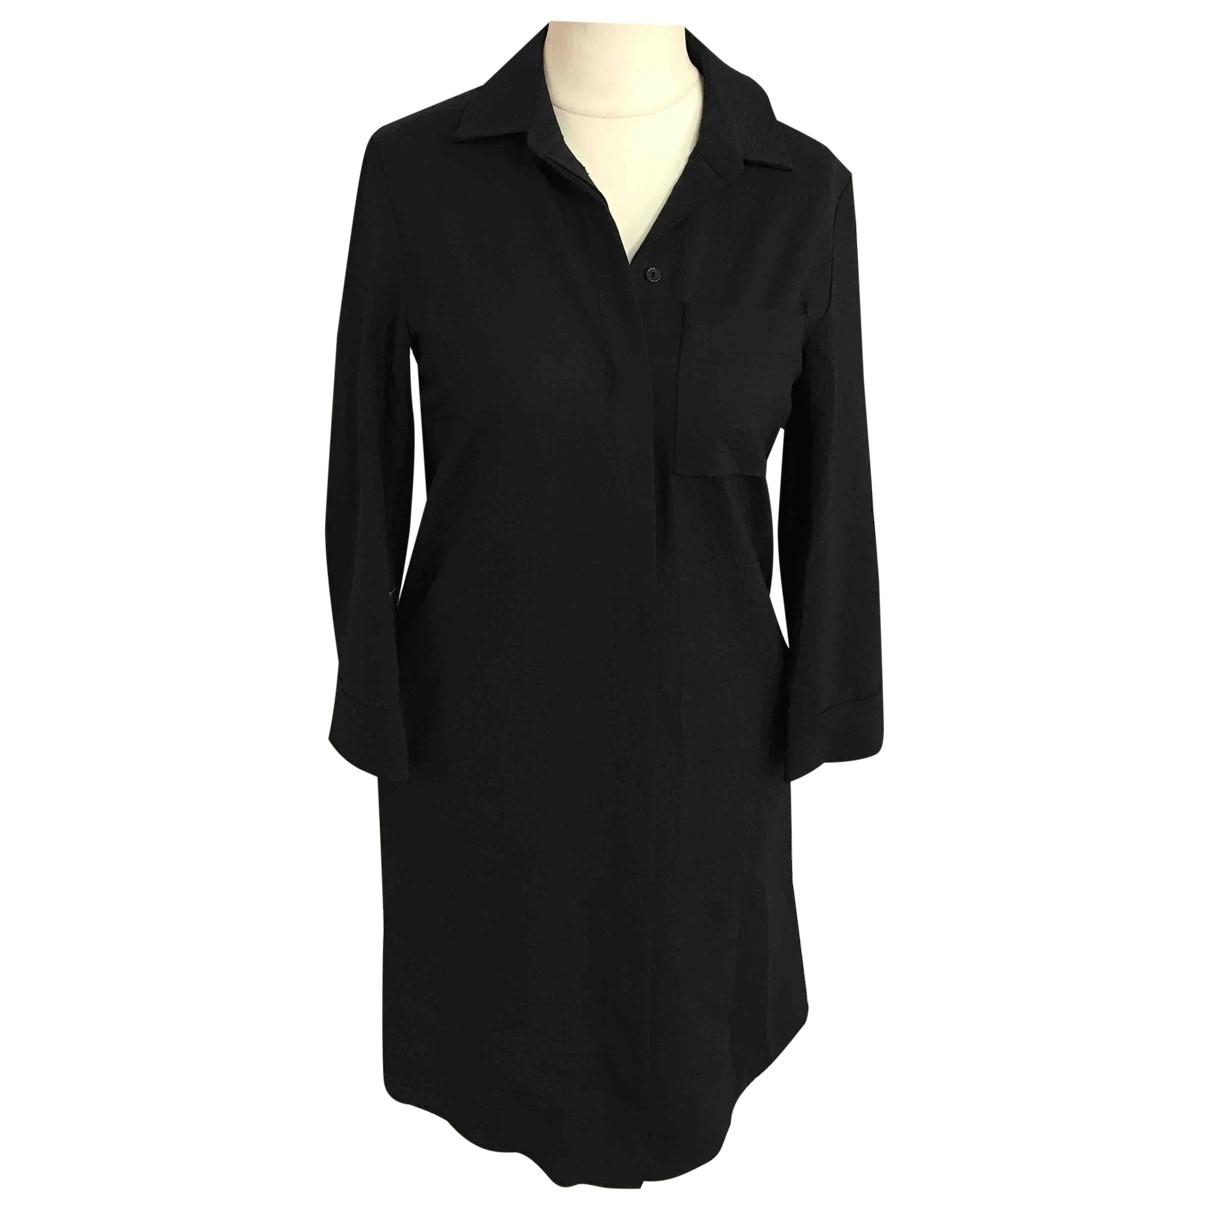 Cos \N Black Wool dress for Women S International